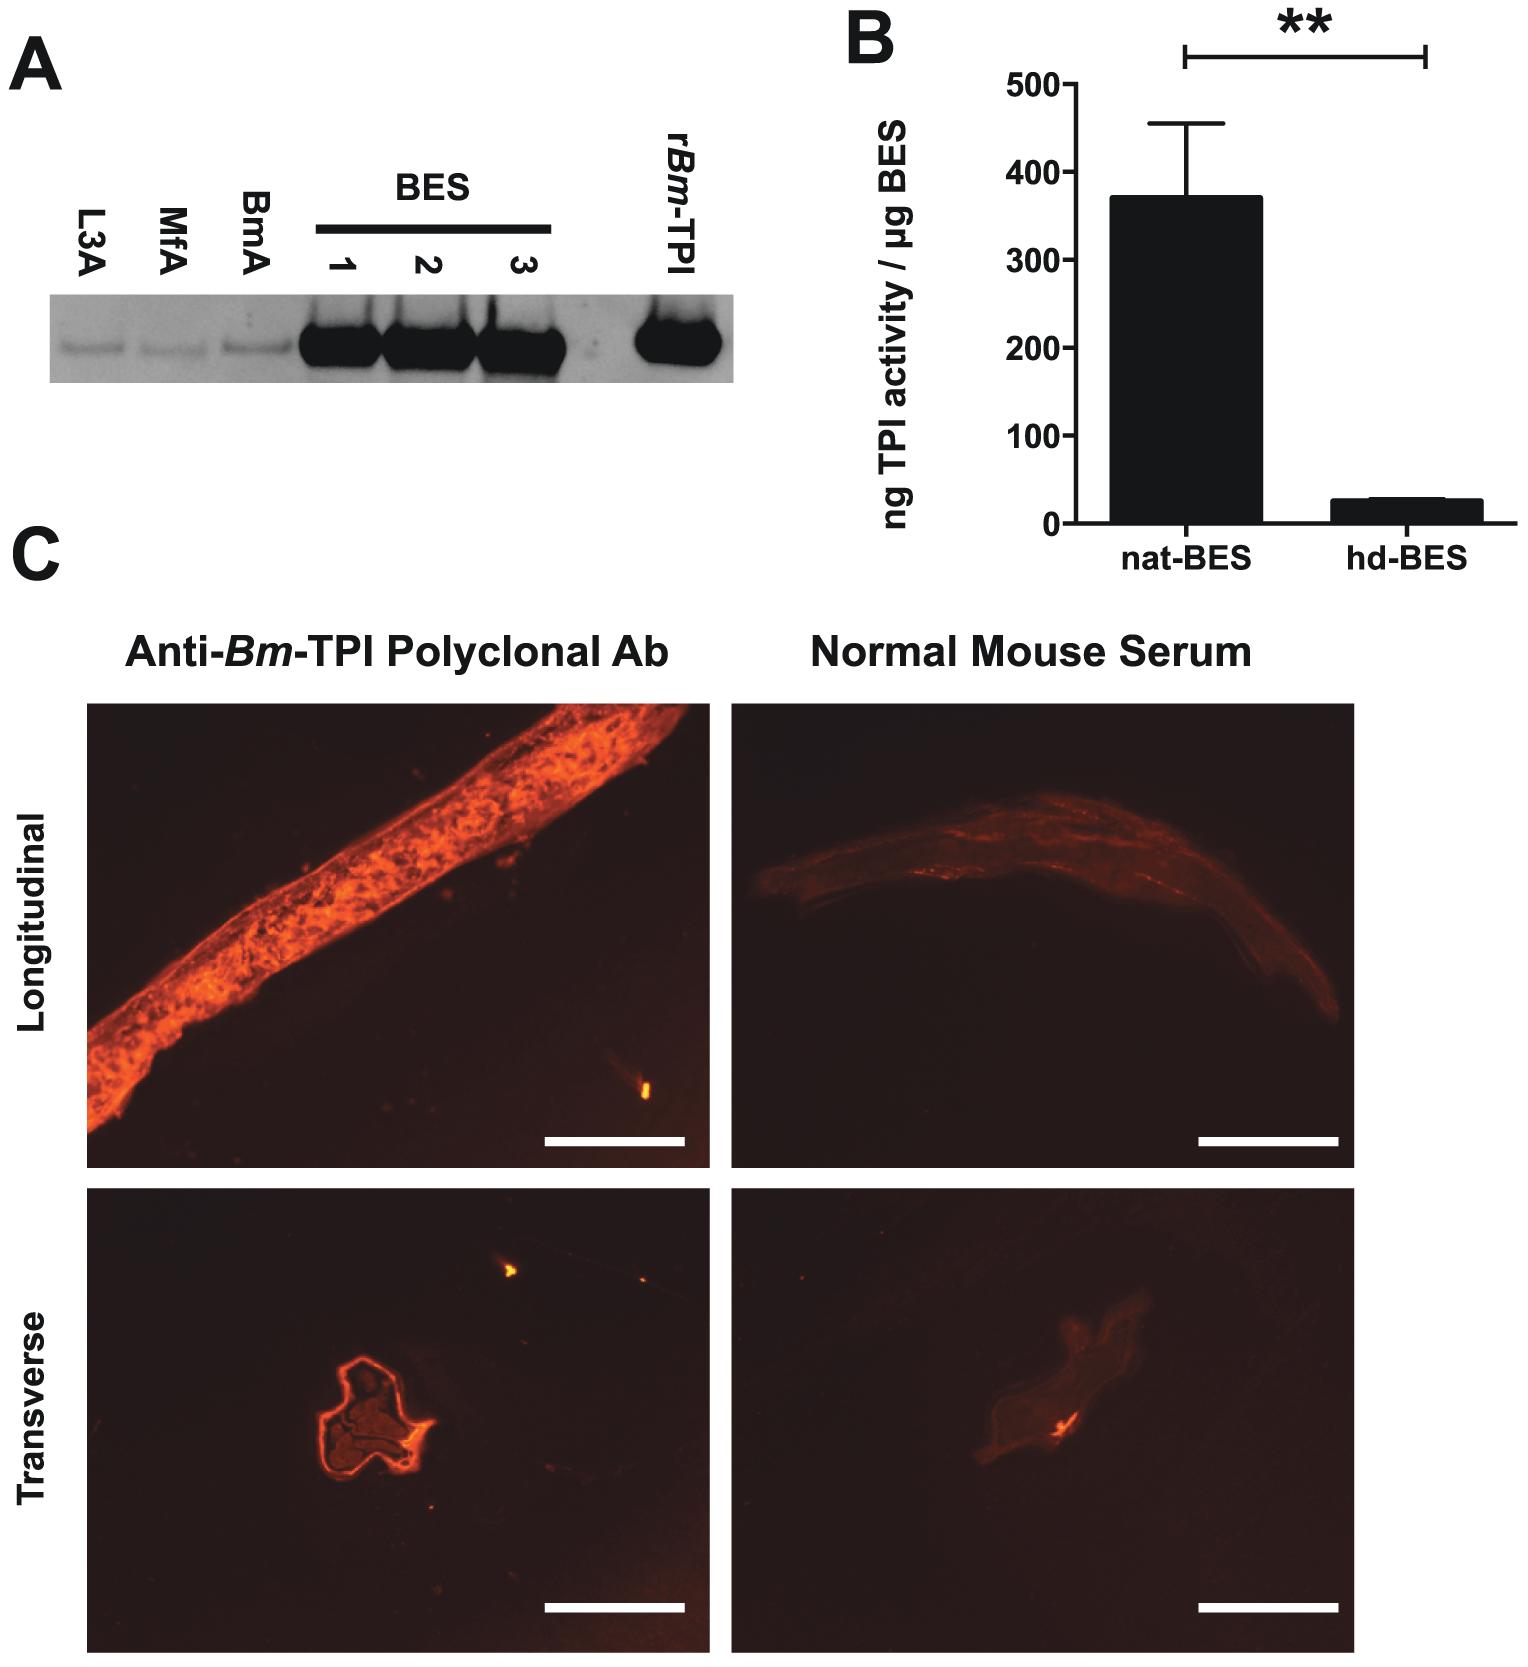 Adult worms preferentially secrete enzymatically active <i>Bm</i>-TPI.